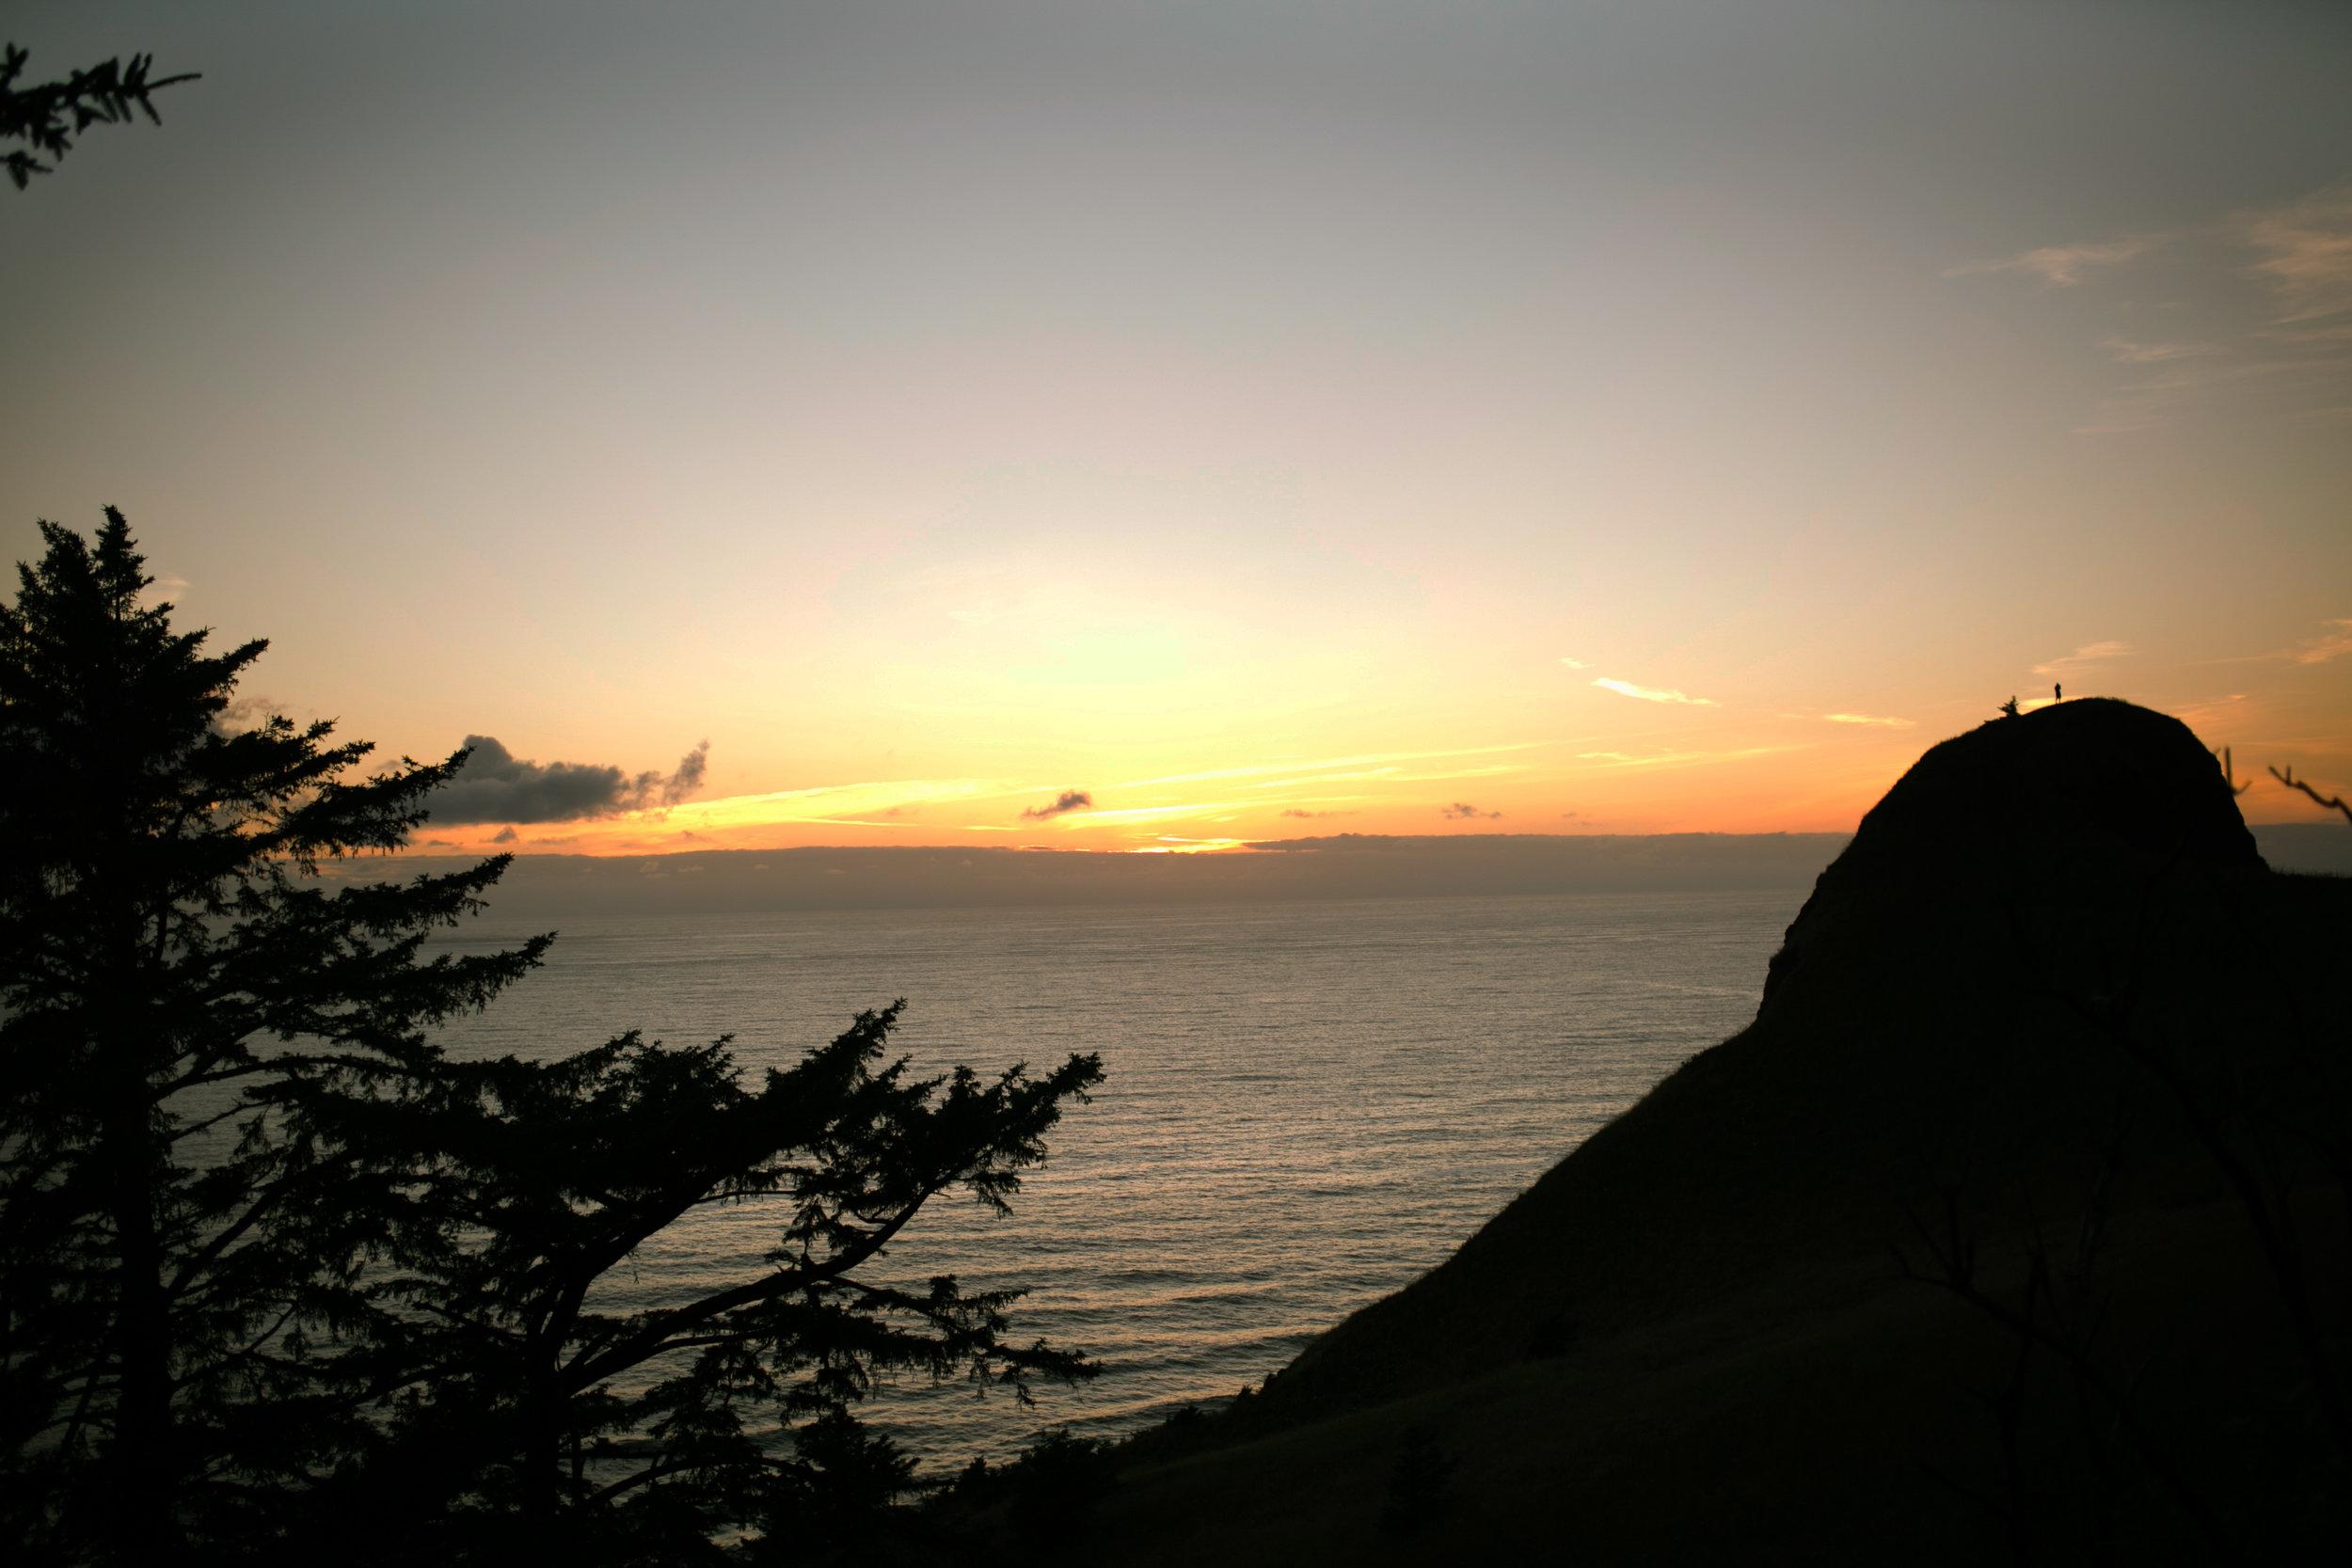 093Travel_Adventure_Outdoor_Photography_Outlive_Creative_Oregon_Coast_Gods_Thumb_sunset.jpg